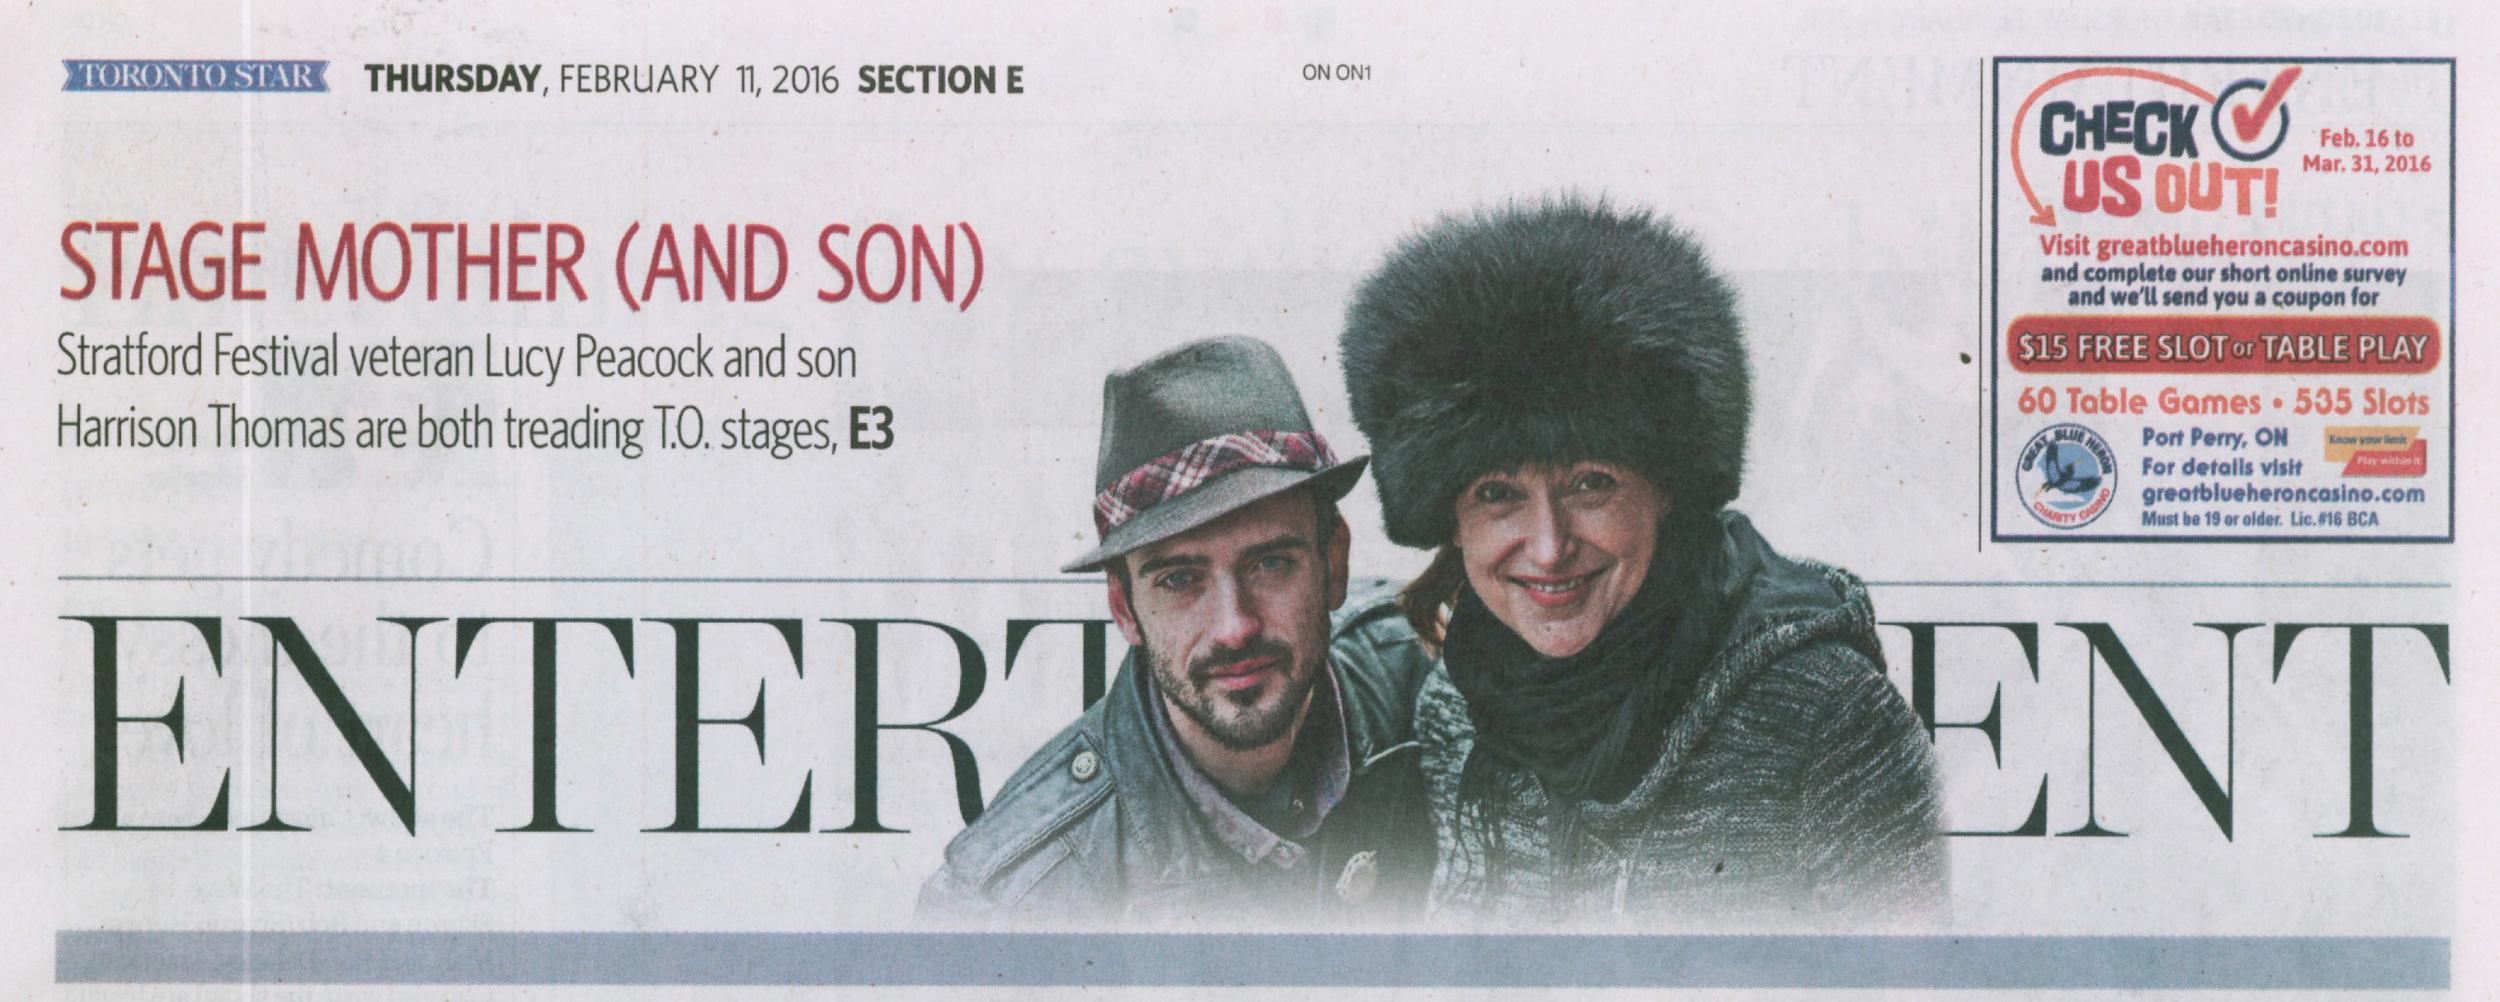 16.02.11 - Toronto Star - THE WINTER'S TALE 1.jpg